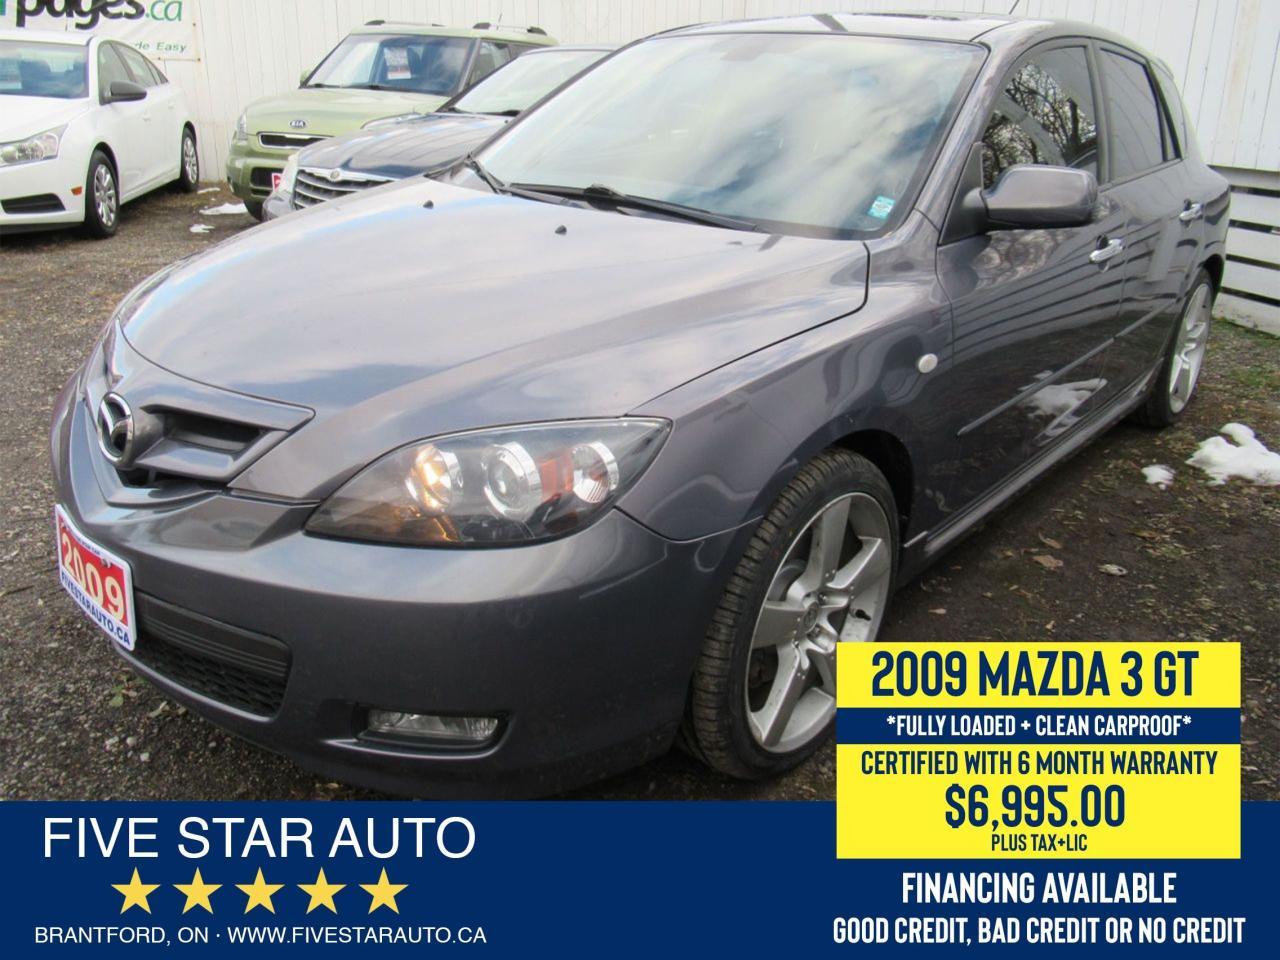 2009 Mazda MAZDA3 GT *Clean Carproof* Certified w/ 6 Month Warranty